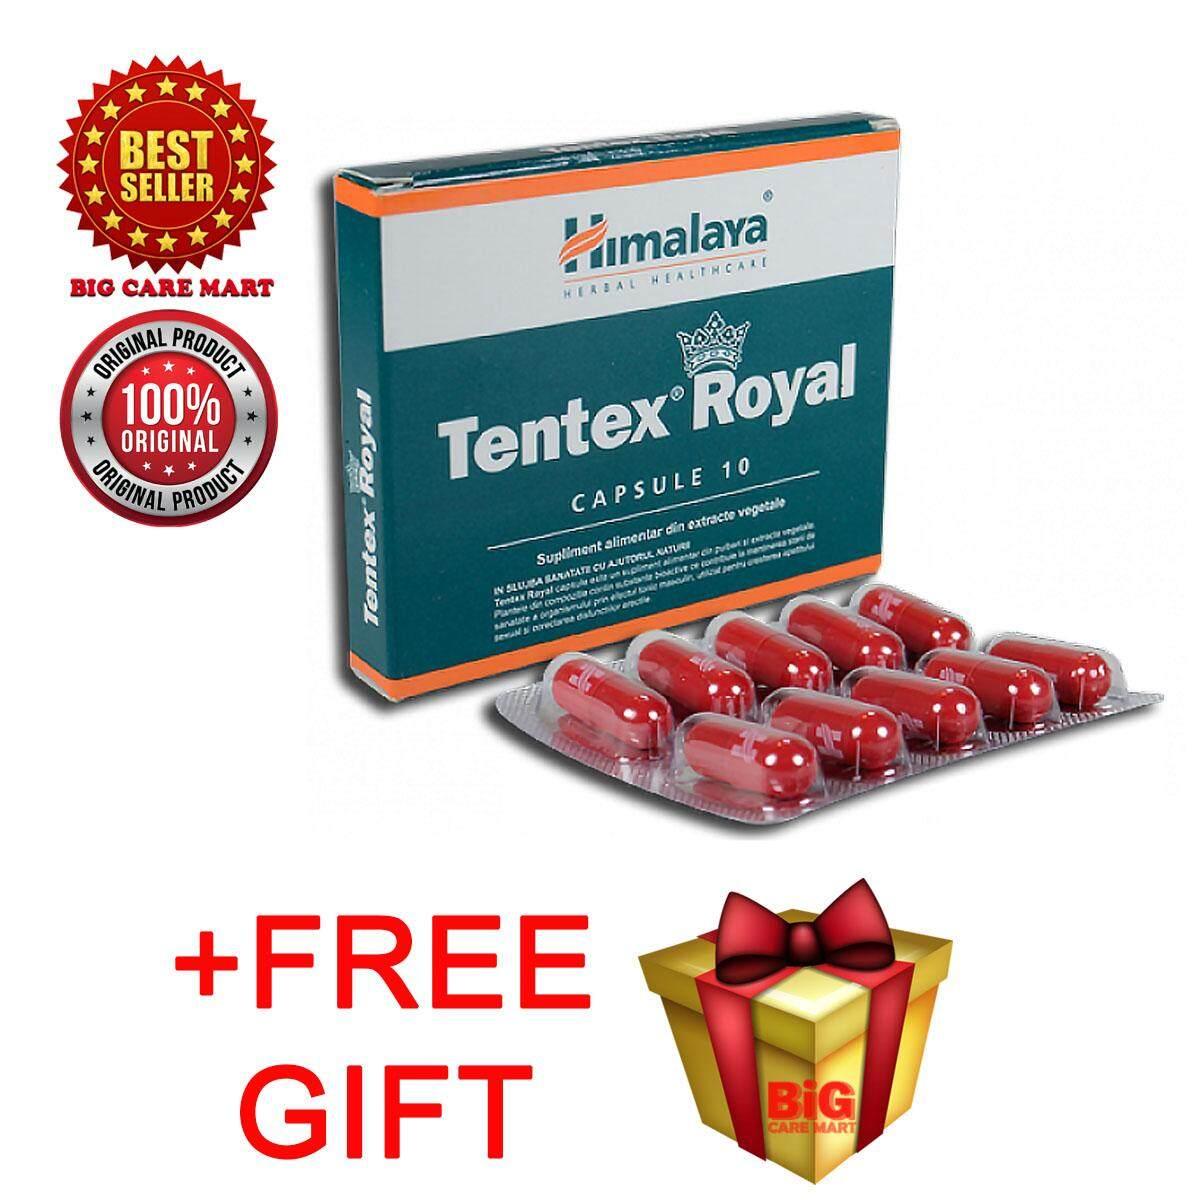 HIMALAYA TENTEX ROYAL 10'S (INCREASE SEX POWER) 100% ORIGINAL WITH KKM APPROVAL + FREE GIFT